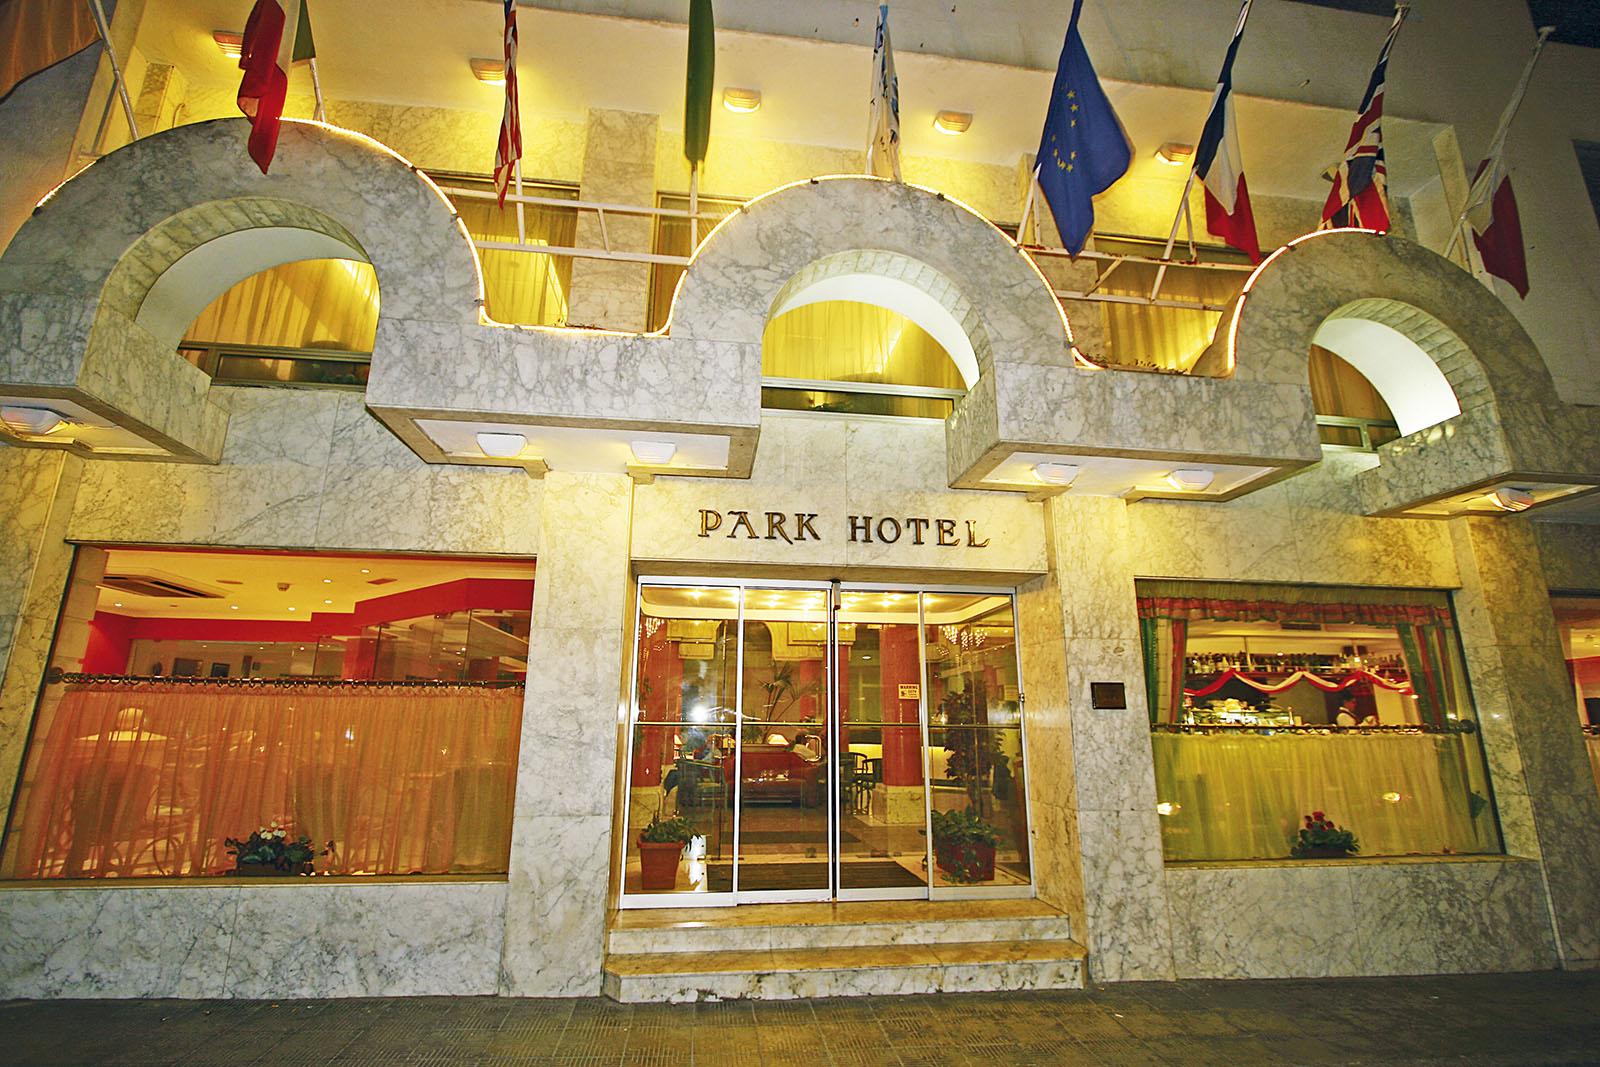 http://www.budavartours.hu/binaries//content/gallery/budavar/locations/accomodations/M%C3%A1lta/sliema---st.-julians/Park+Hotel/park_hotel_sliema_fobejarat.jpg